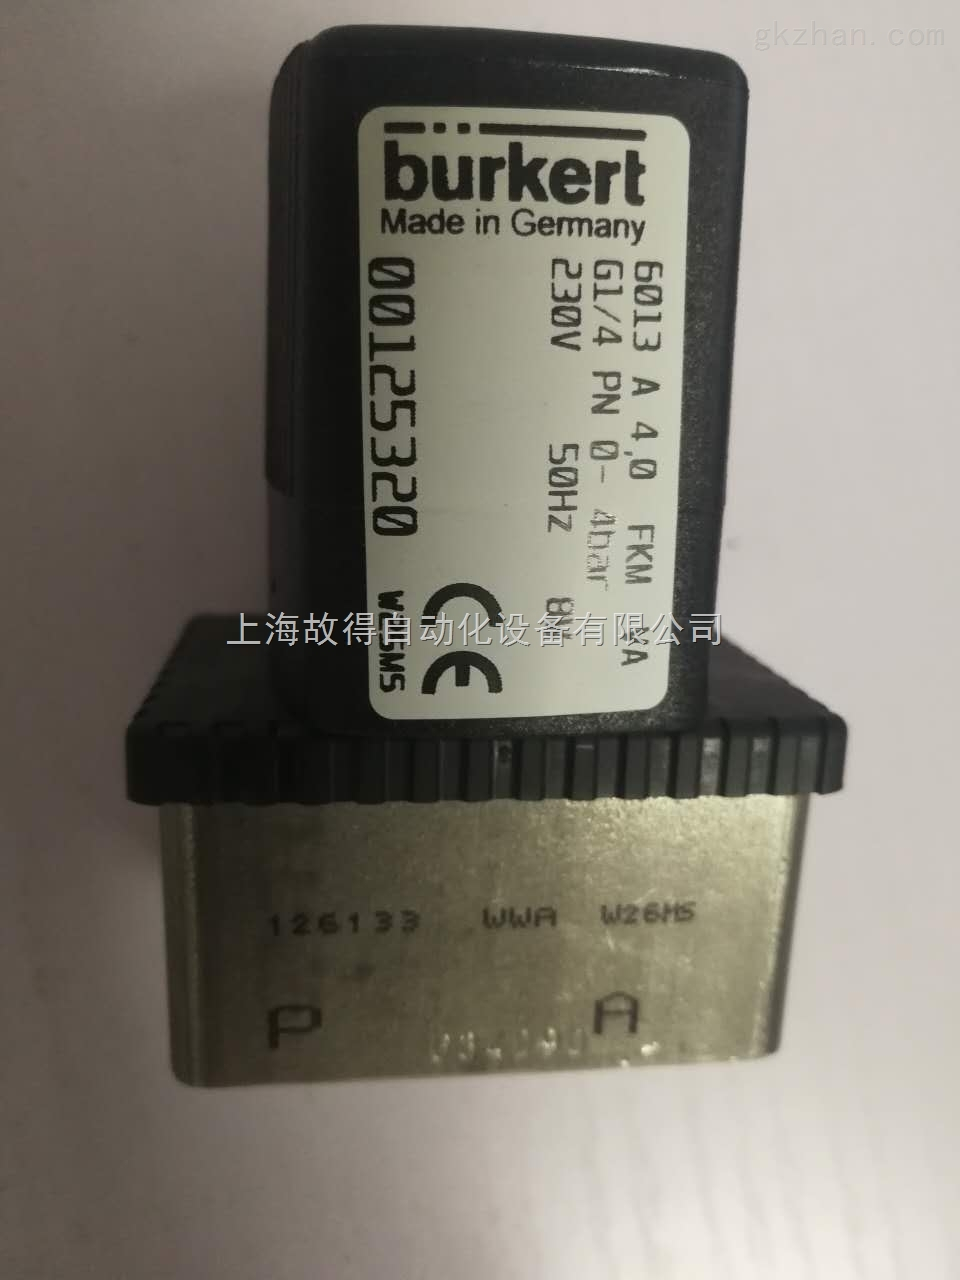 burkert6013 A 电磁阀带手动开关的有哪些